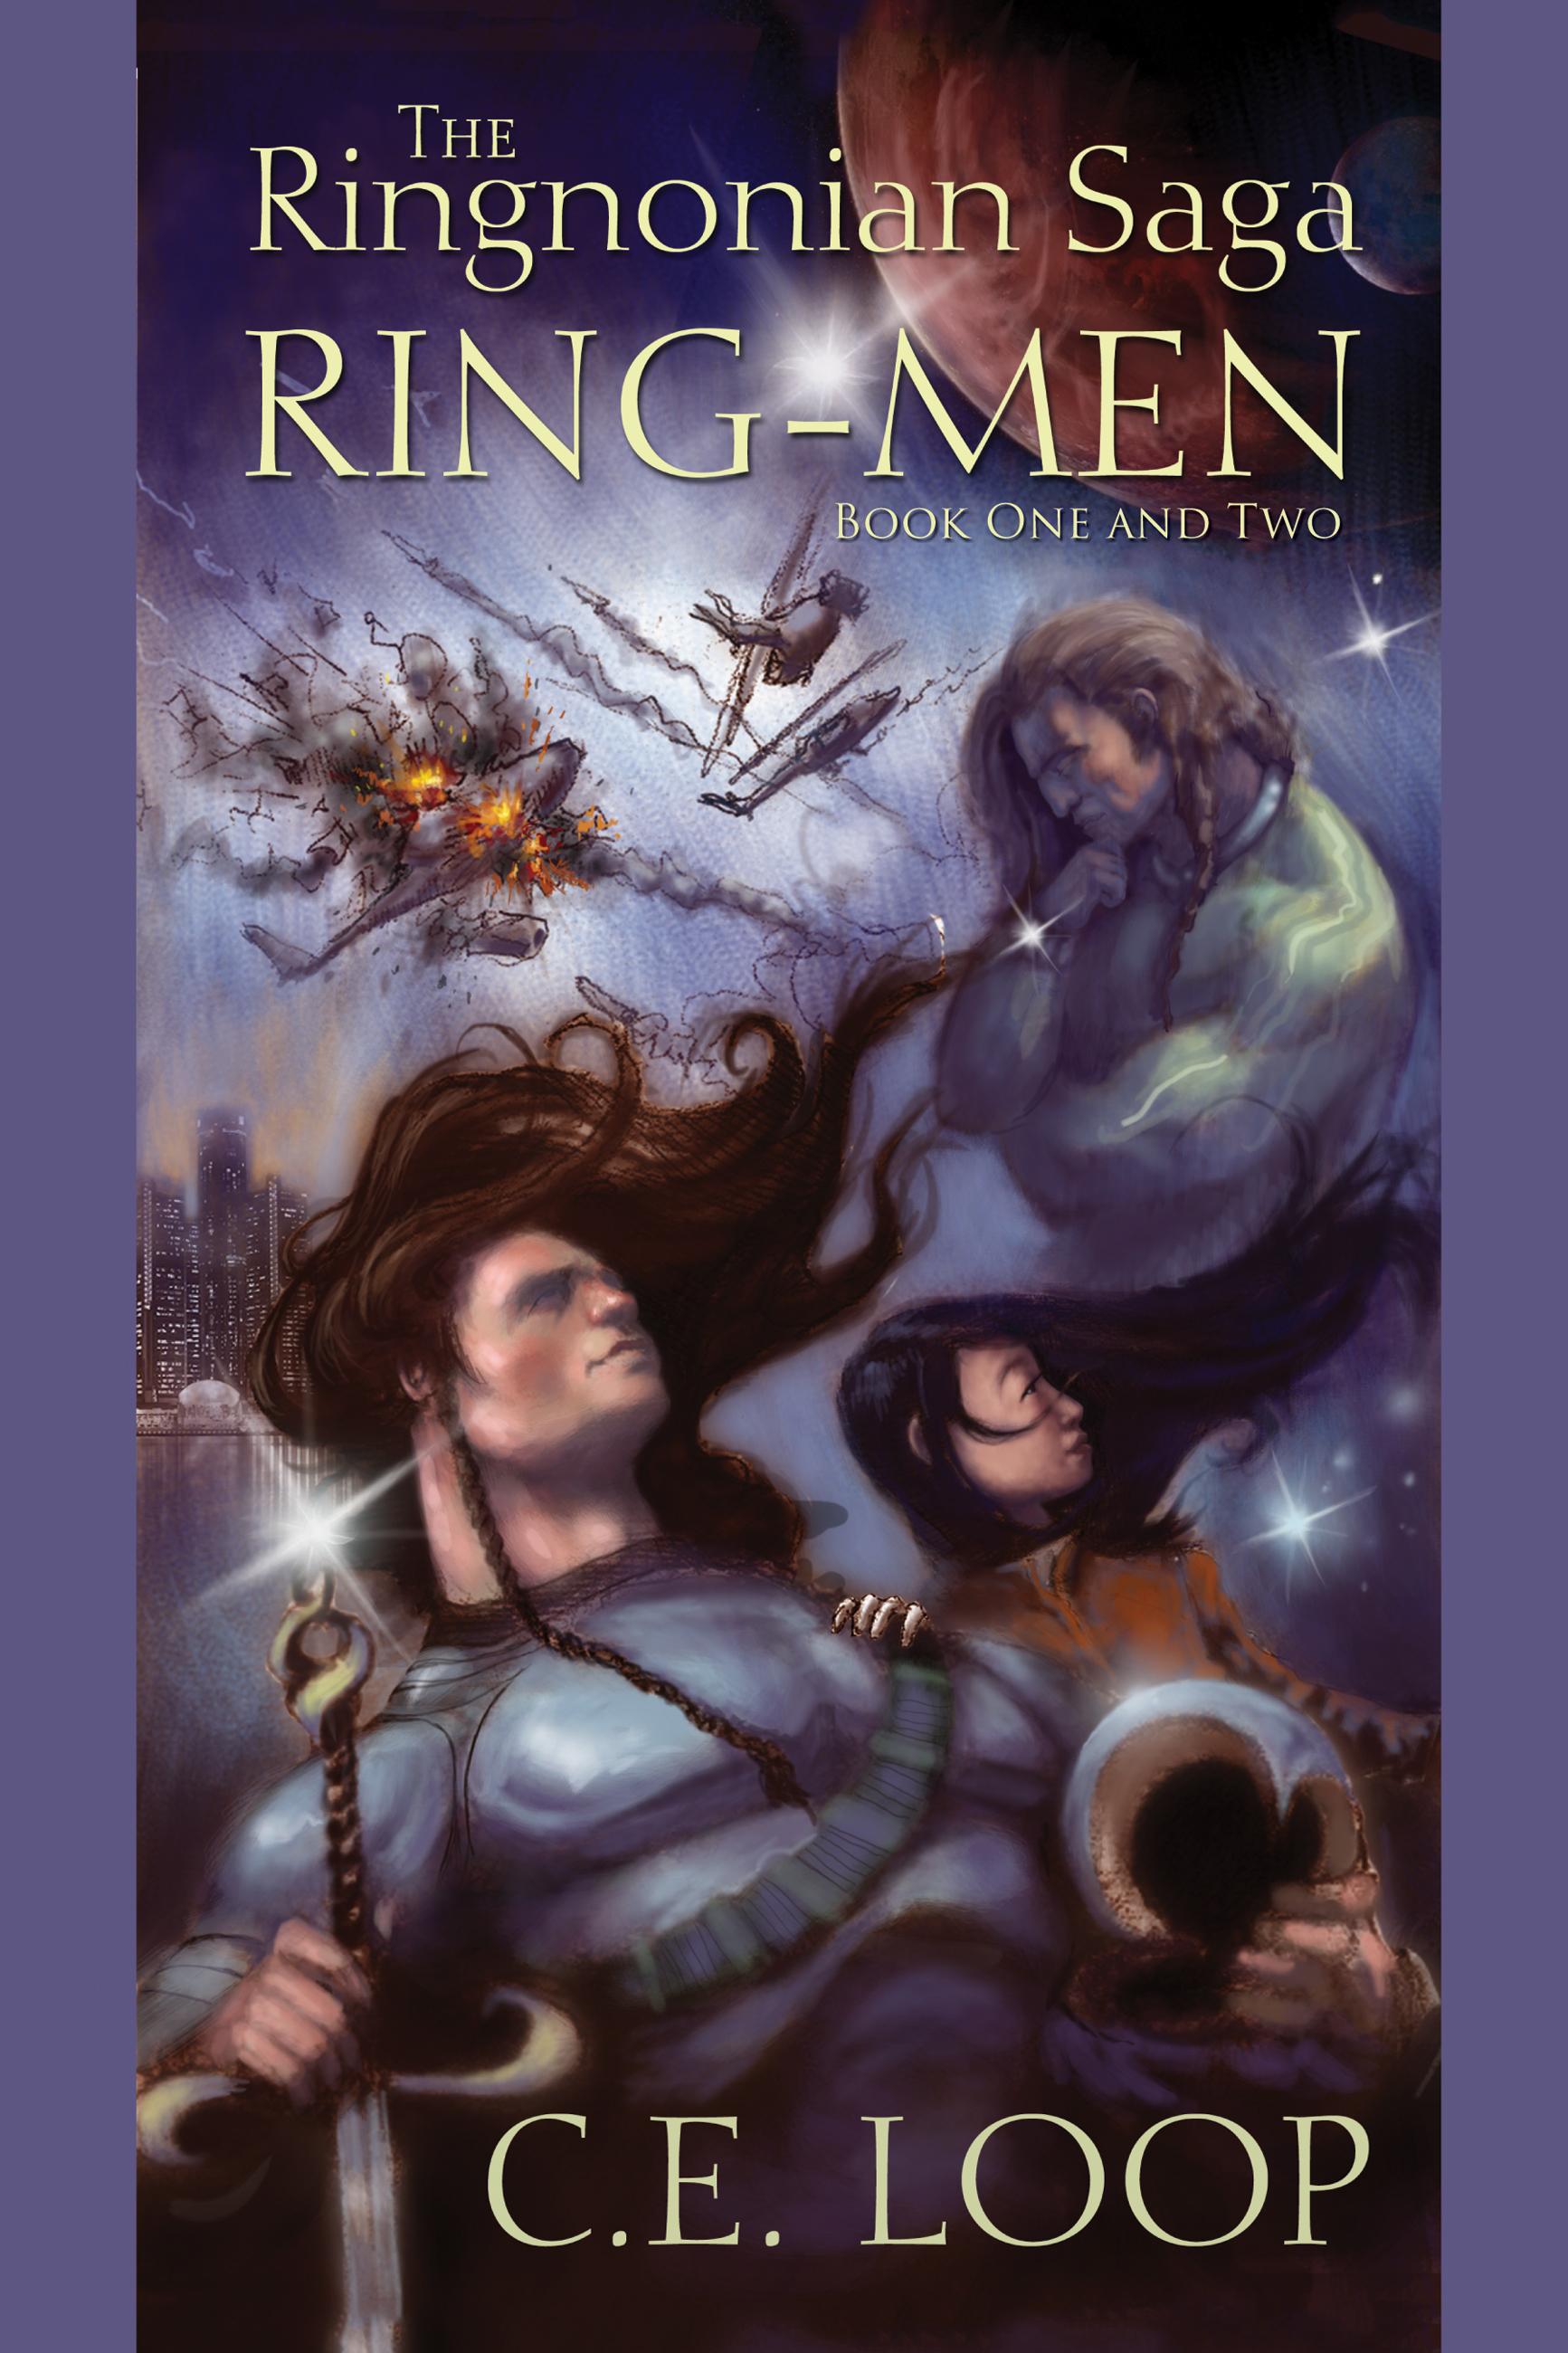 The Ringnonian Saga: Ring-Men Book One and Two C.E. Loop